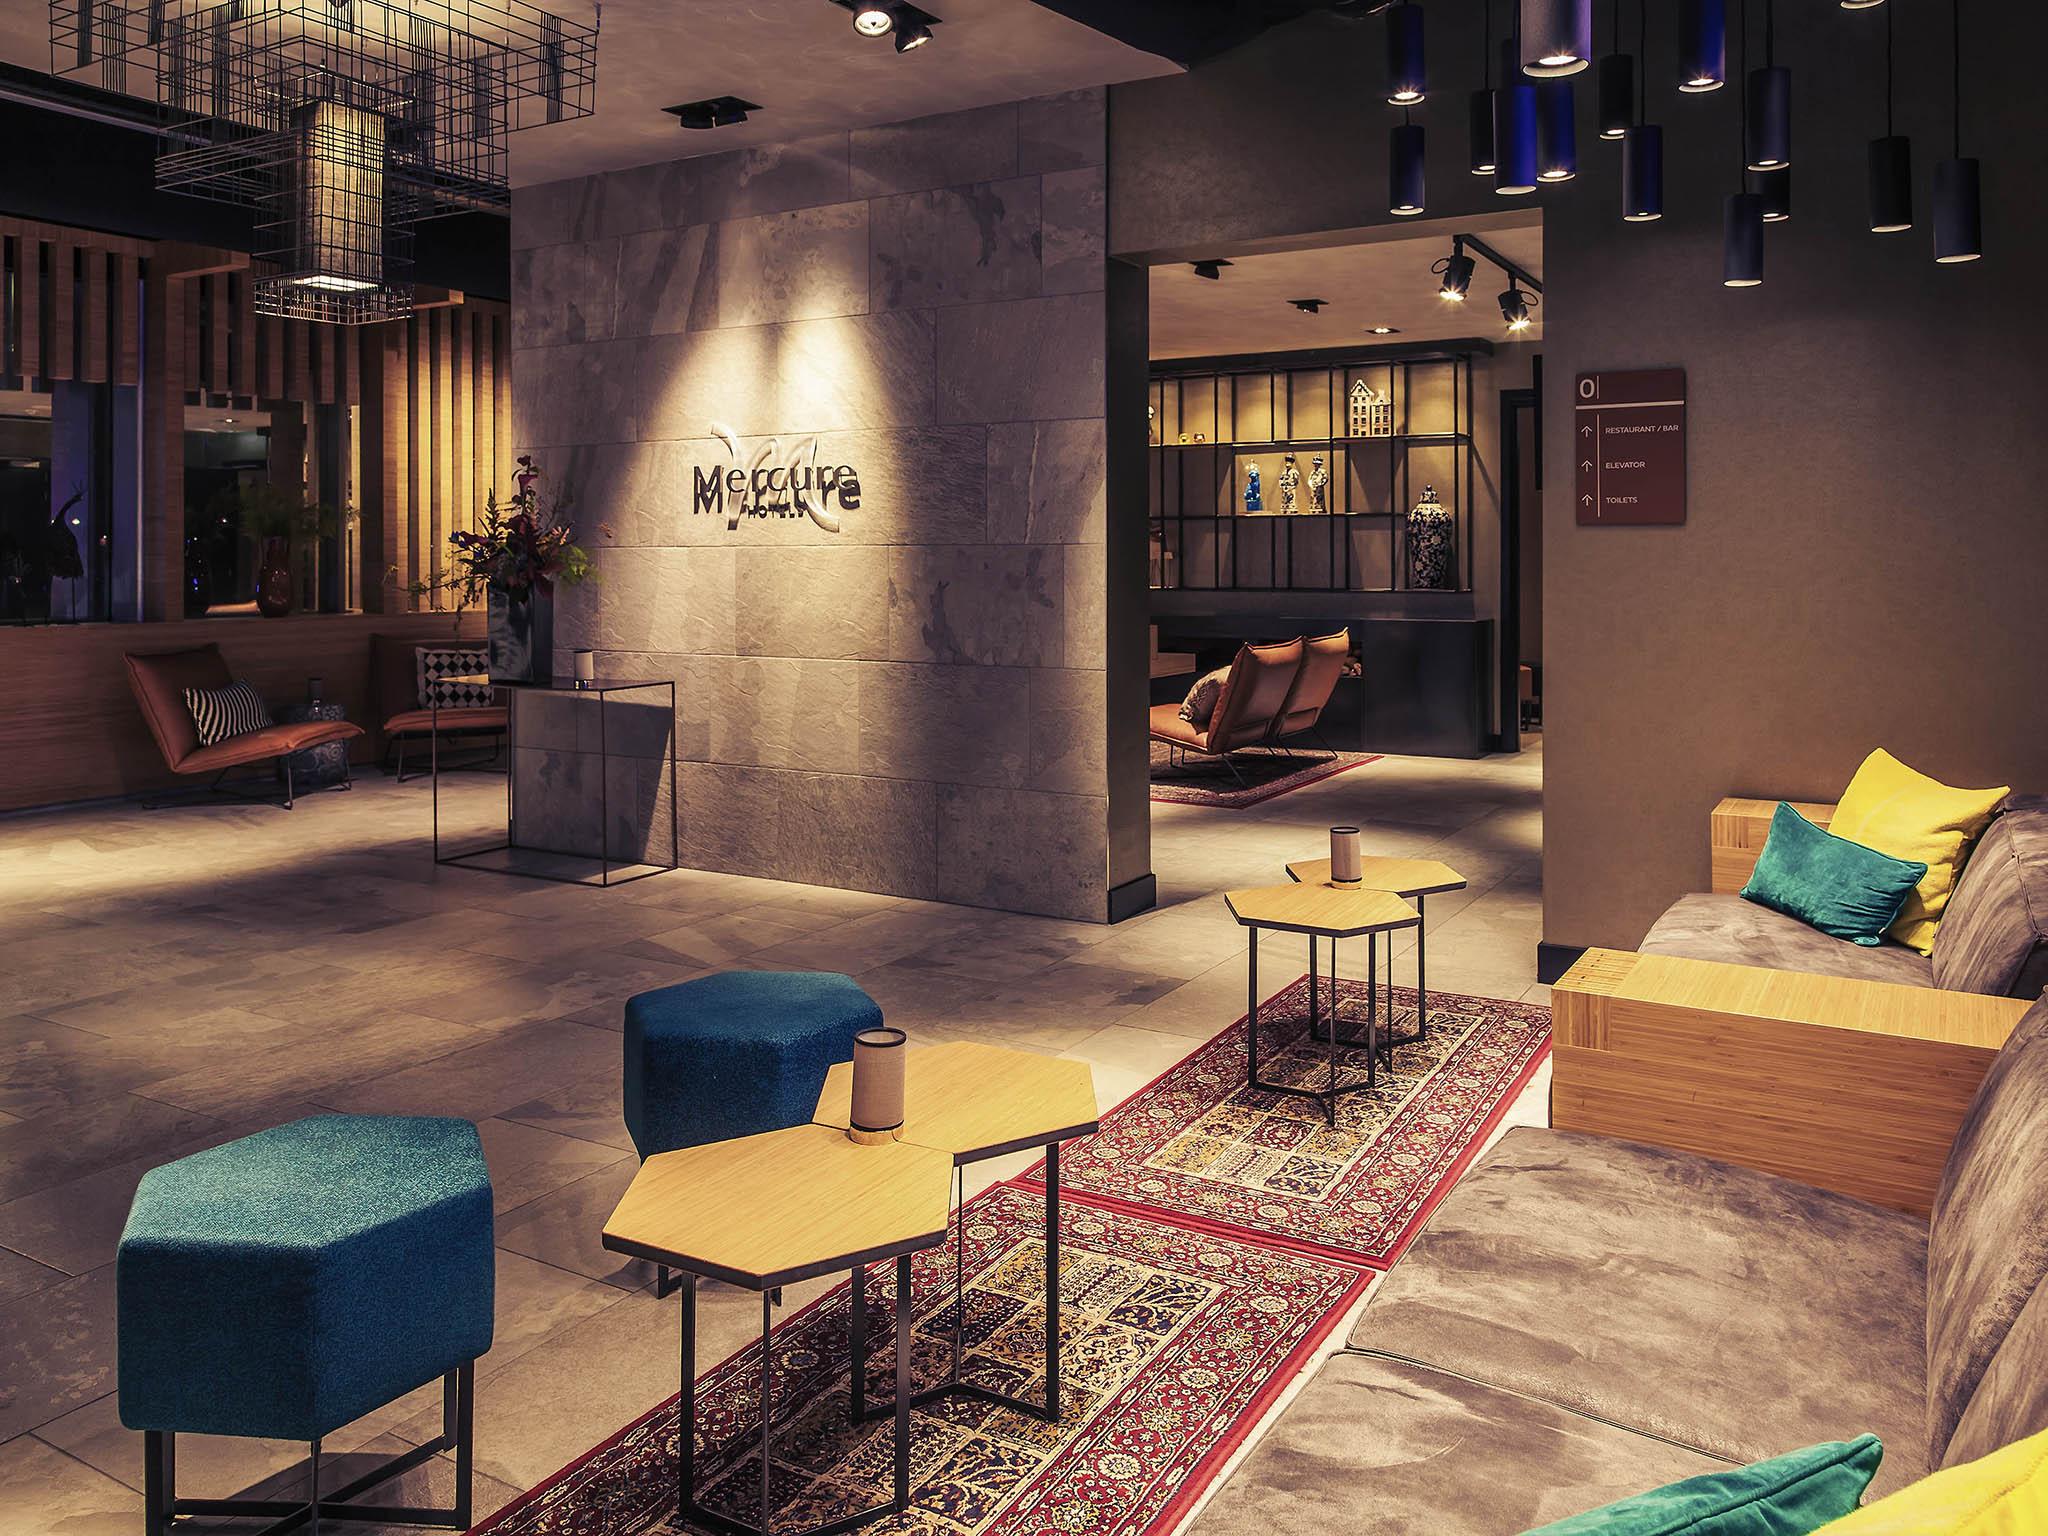 فندق - فندق مركيور Mercure أمستردام سلوتردجيك ستايشن